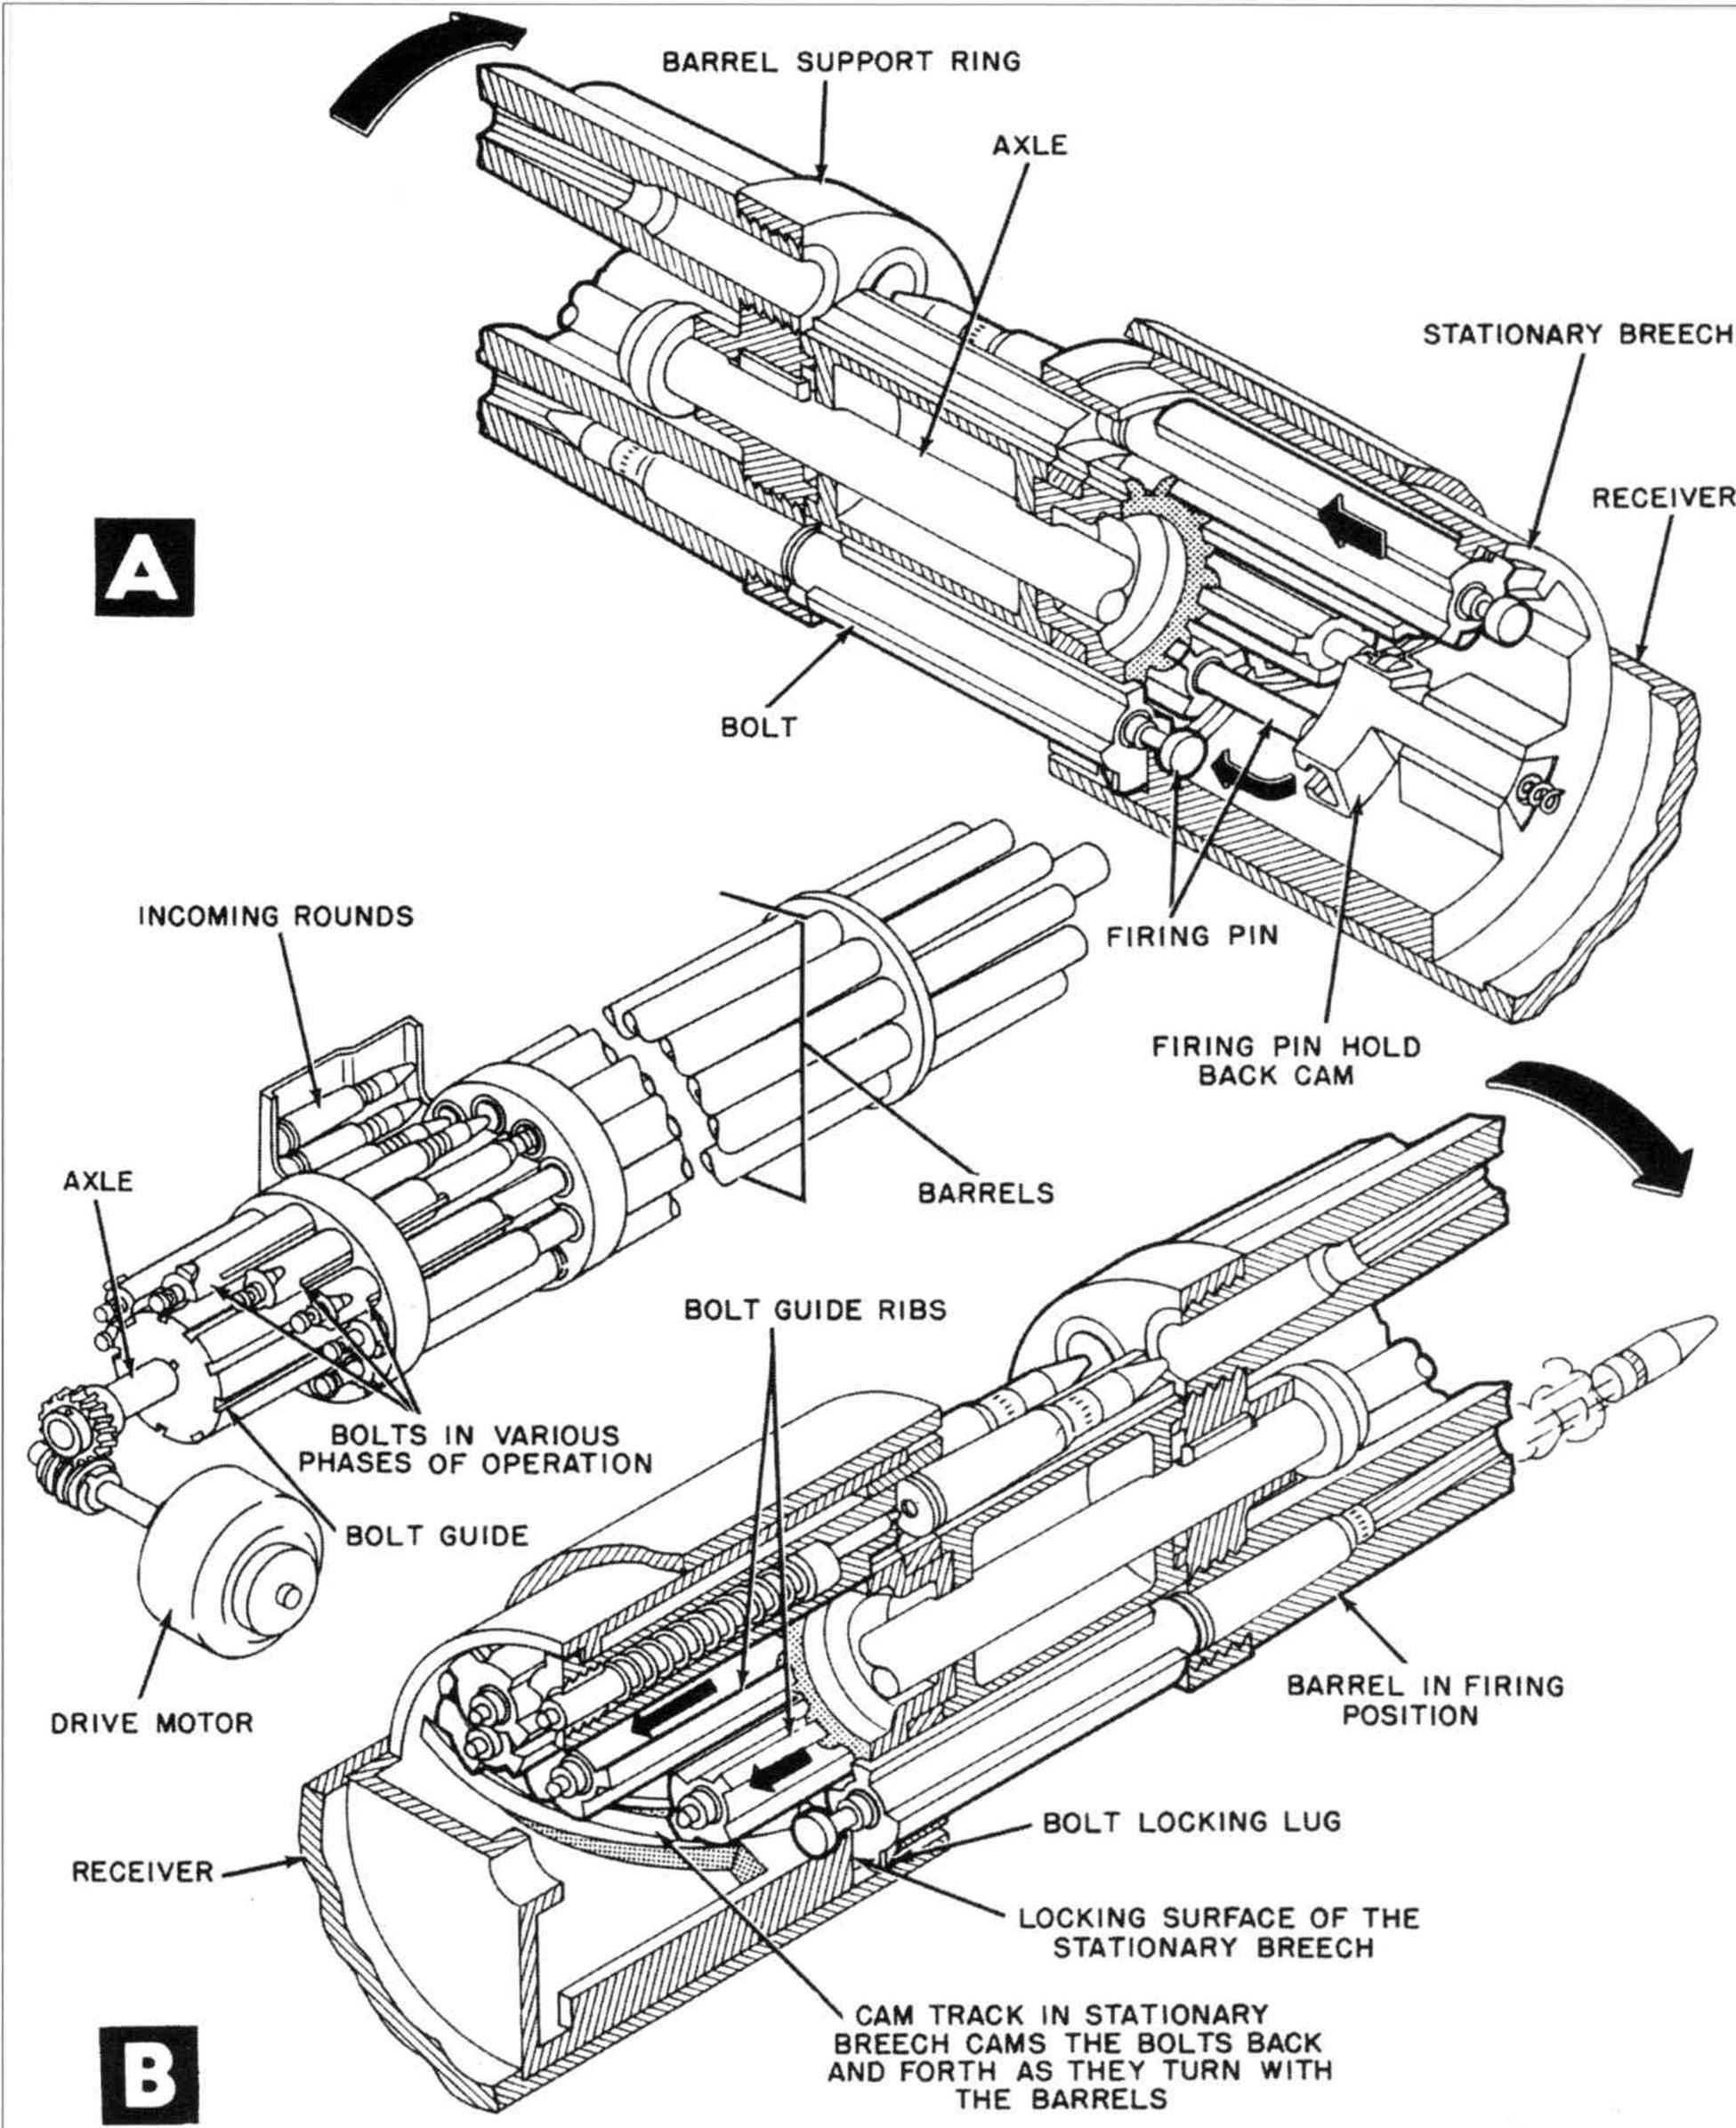 Saab 92x Fuse Box Auto Diagram Electrical For 9 7x Wiring